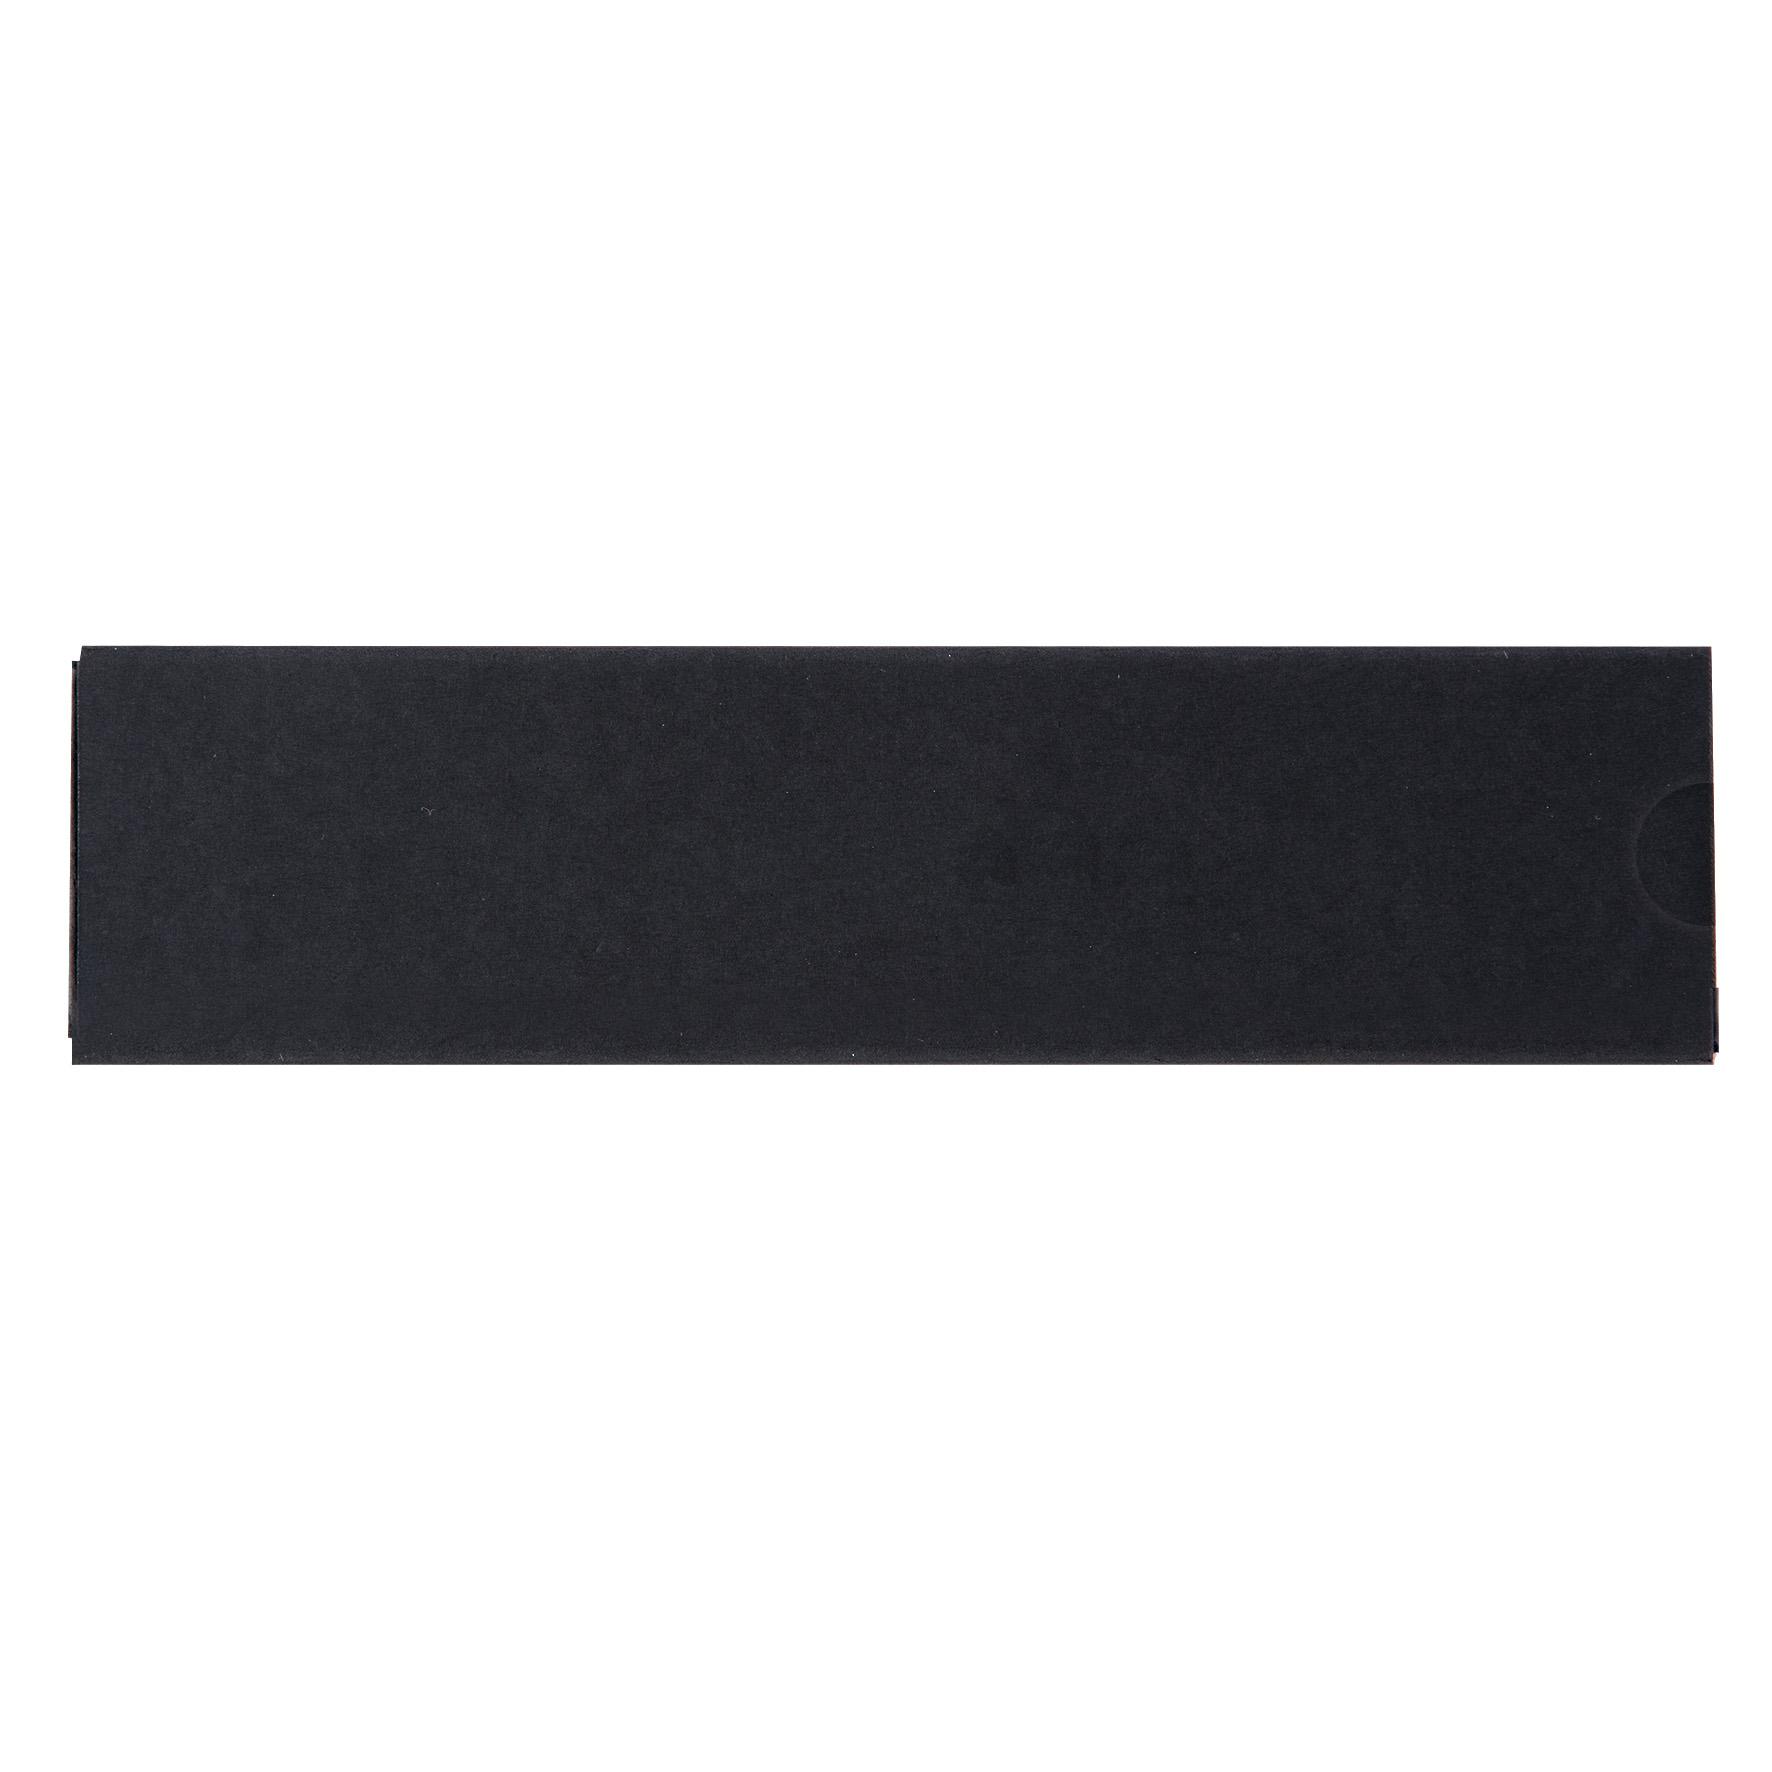 ETUI-FOURREAU BLACK 2 CRAYONS